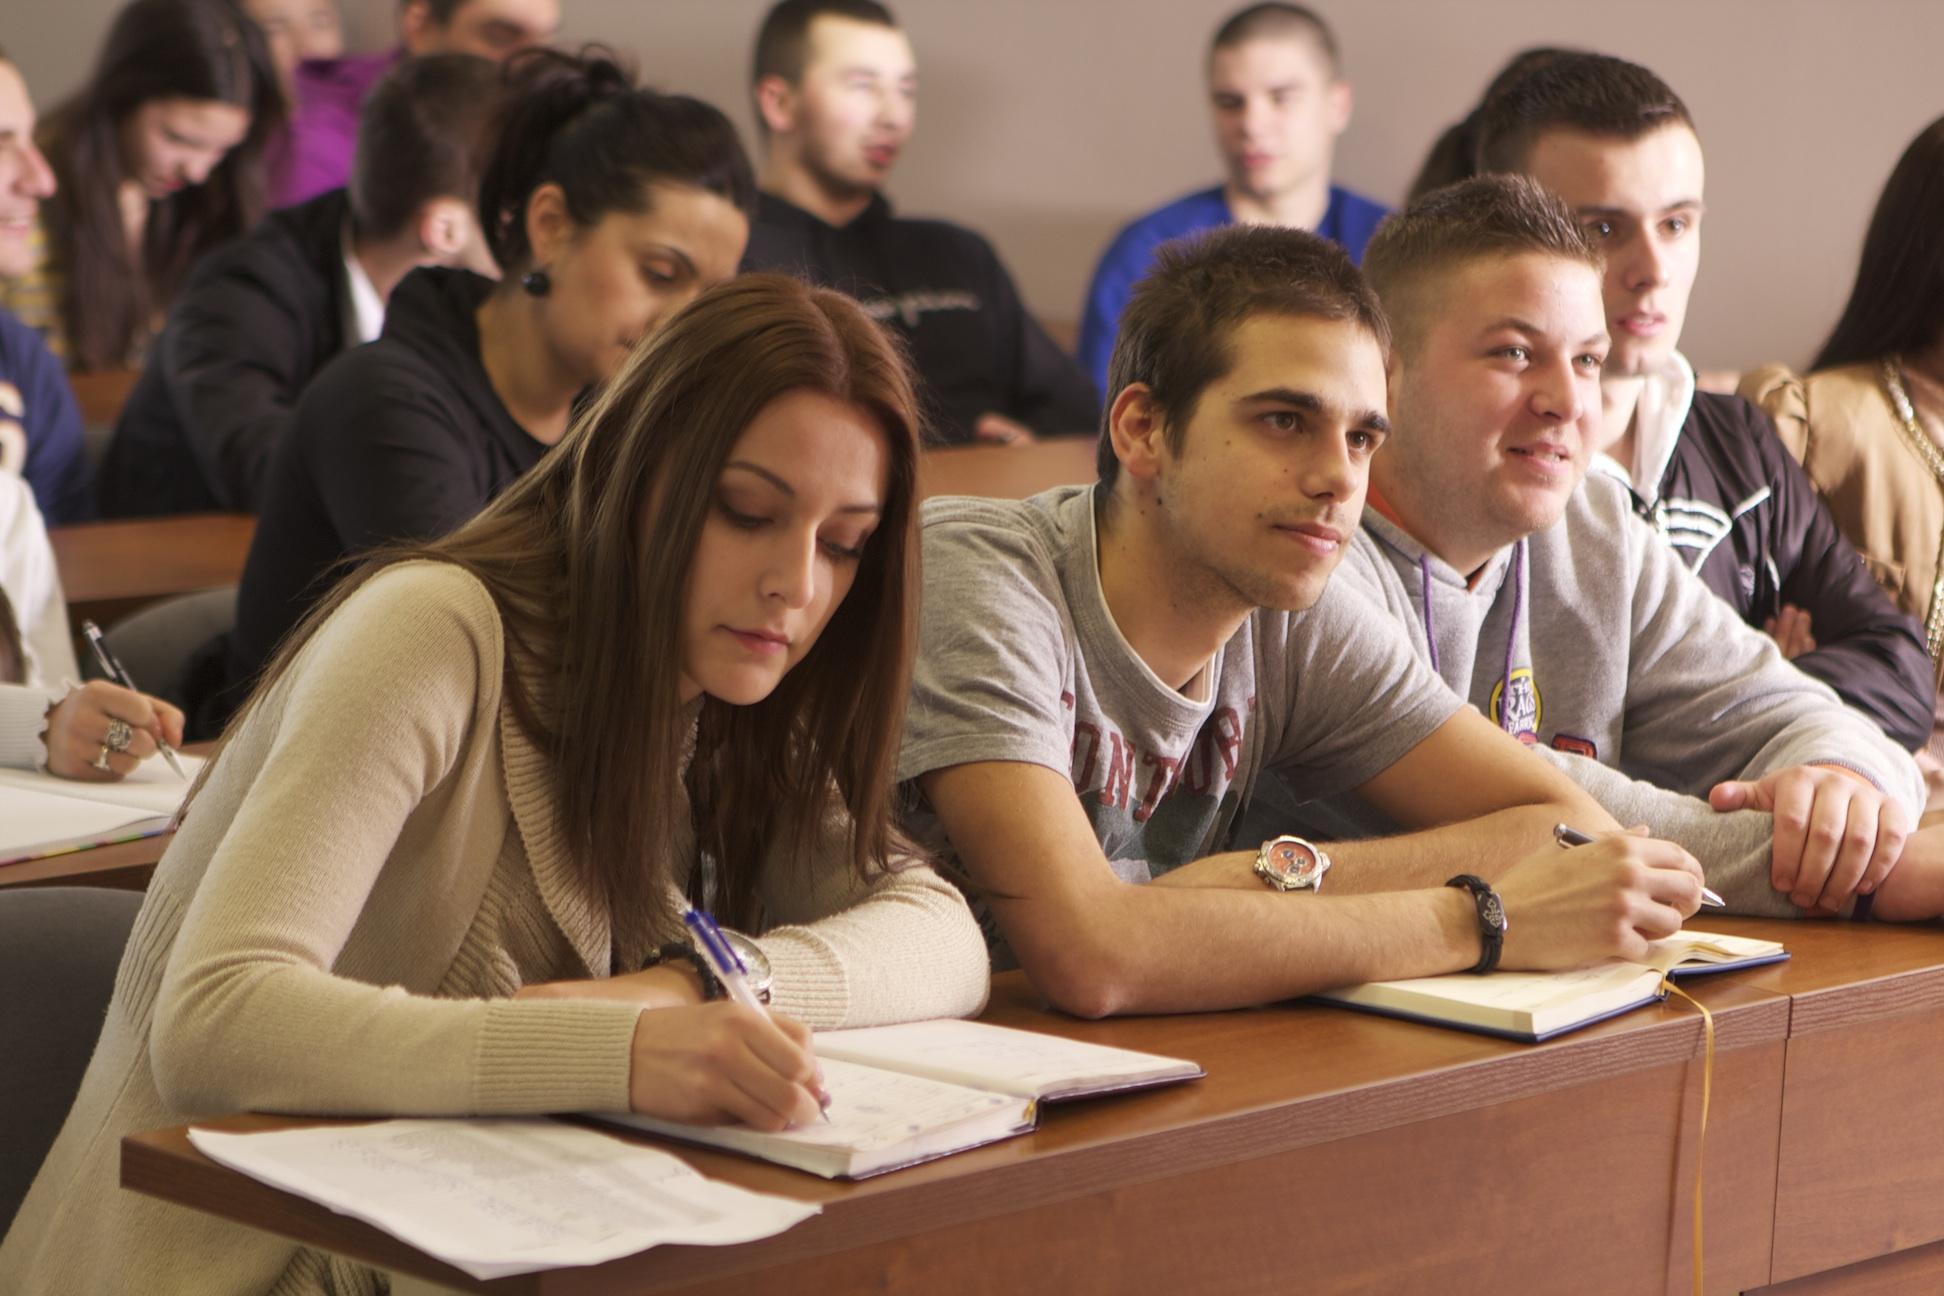 Otkrivene prevare 40 studenata